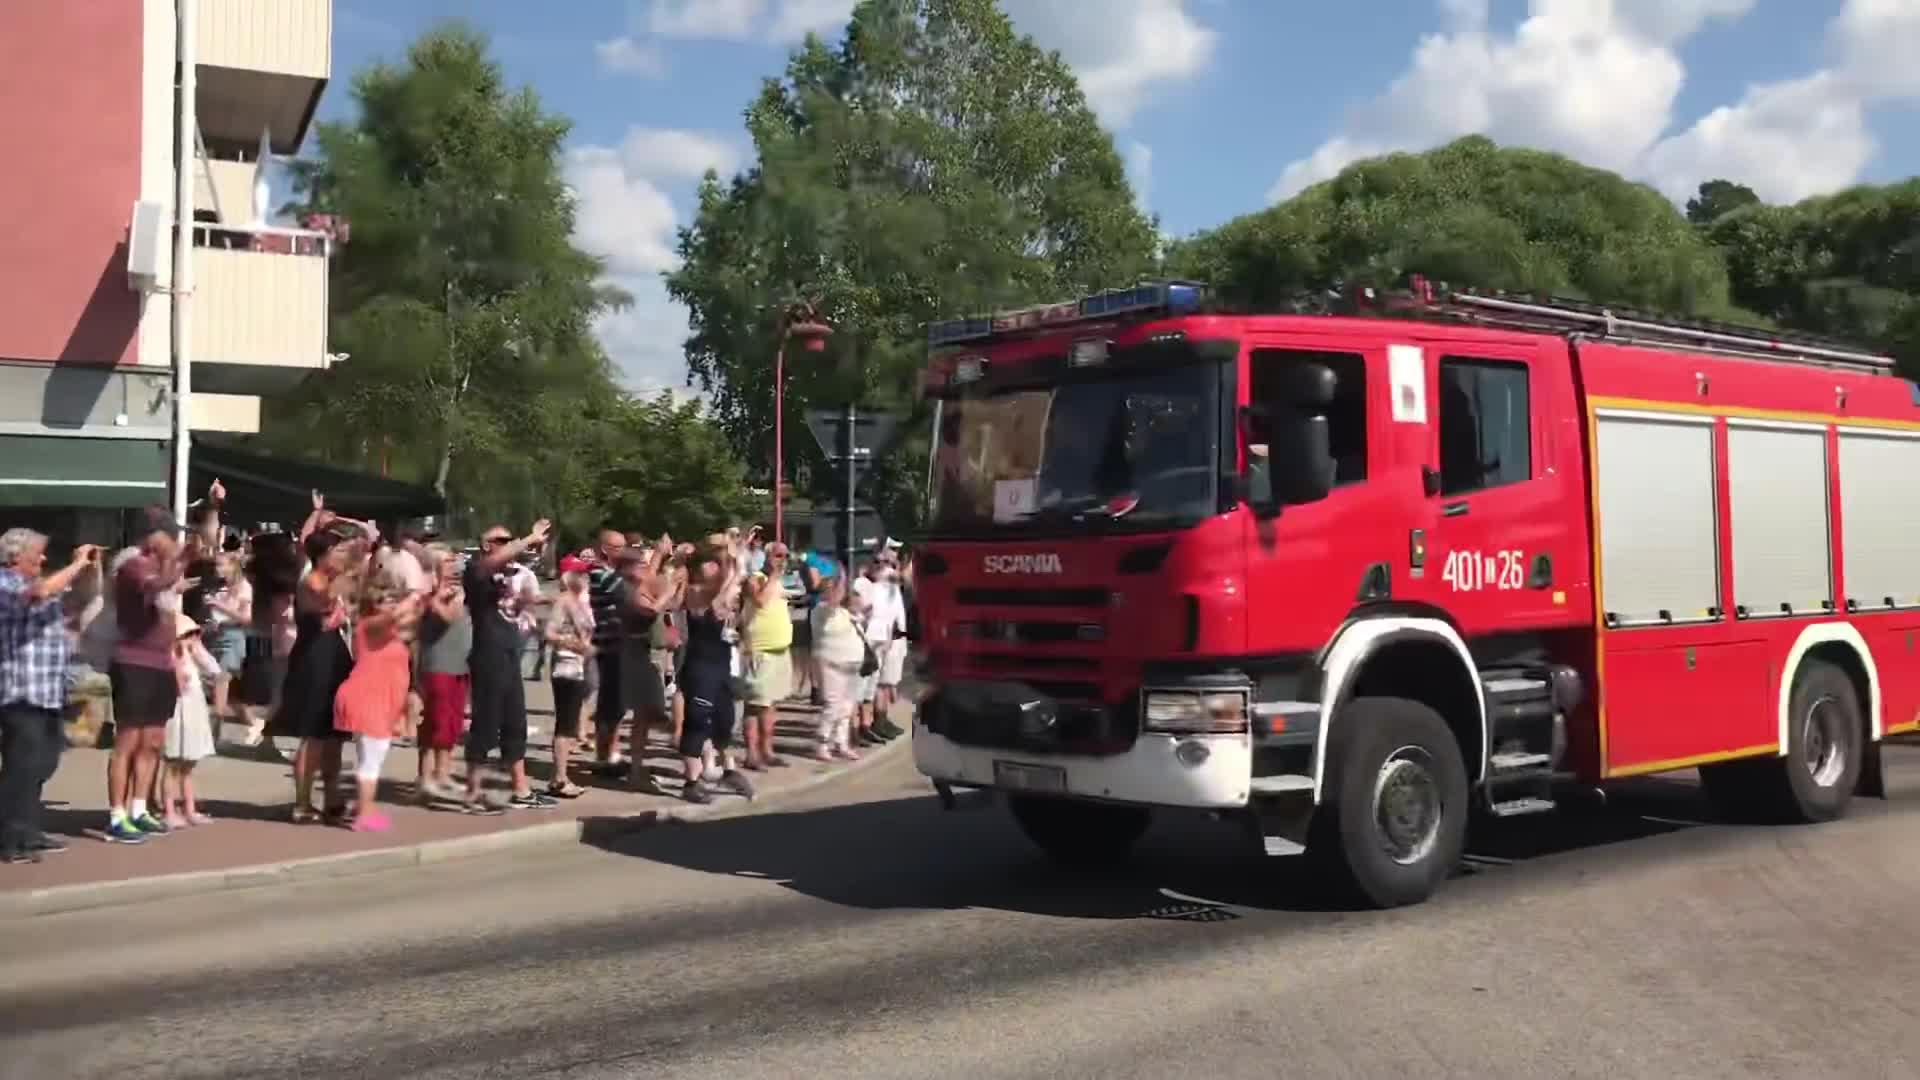 polish firetrucks arriving in sweden GIFs